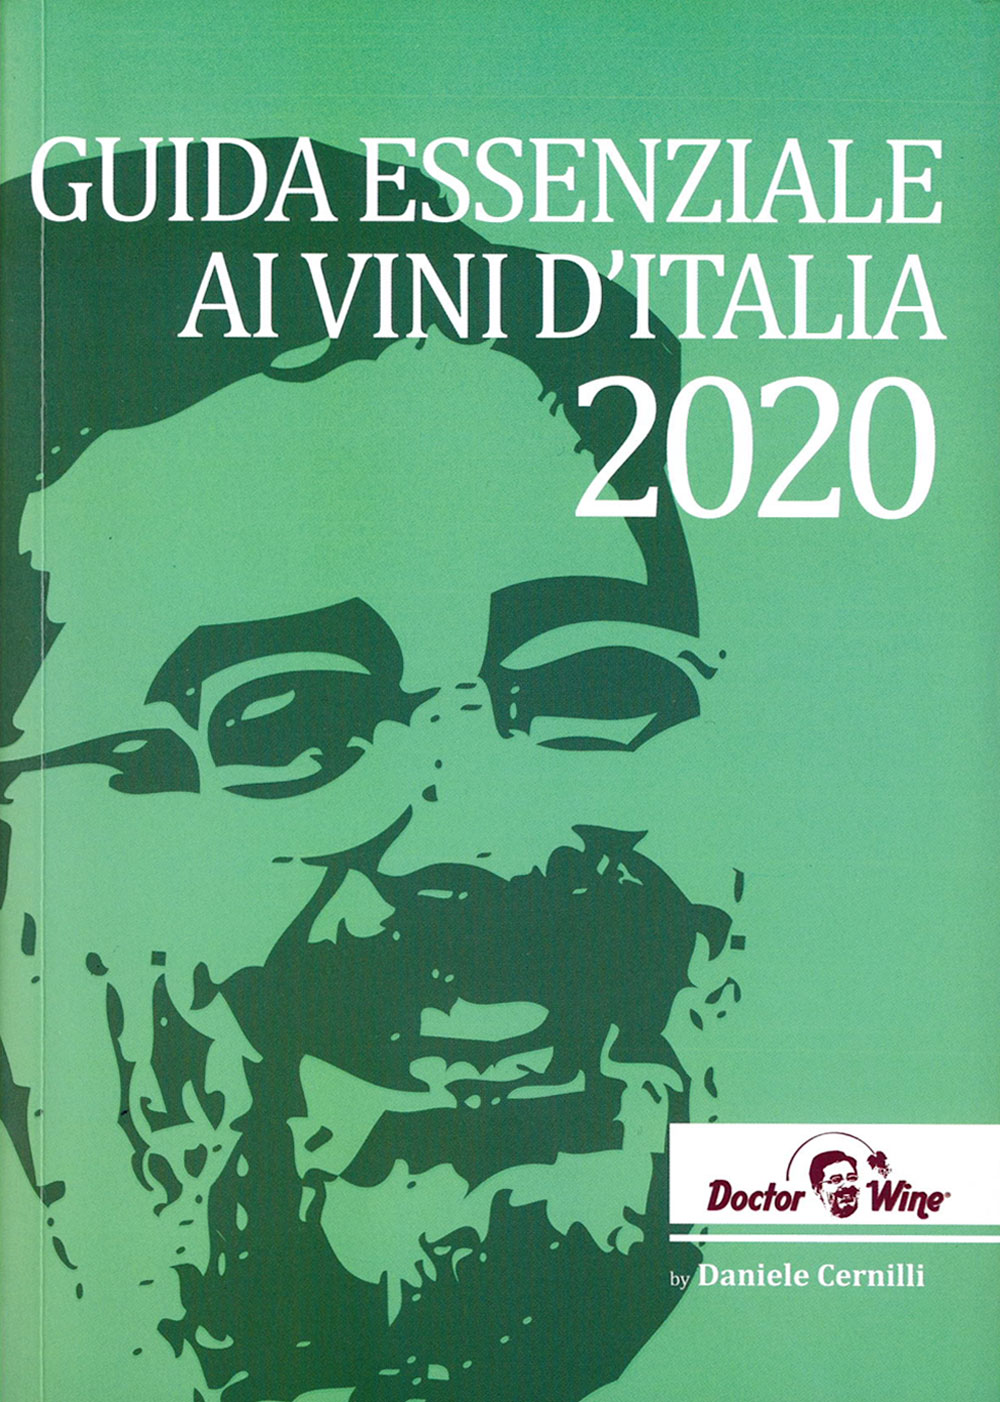 Doctor-wine-2020